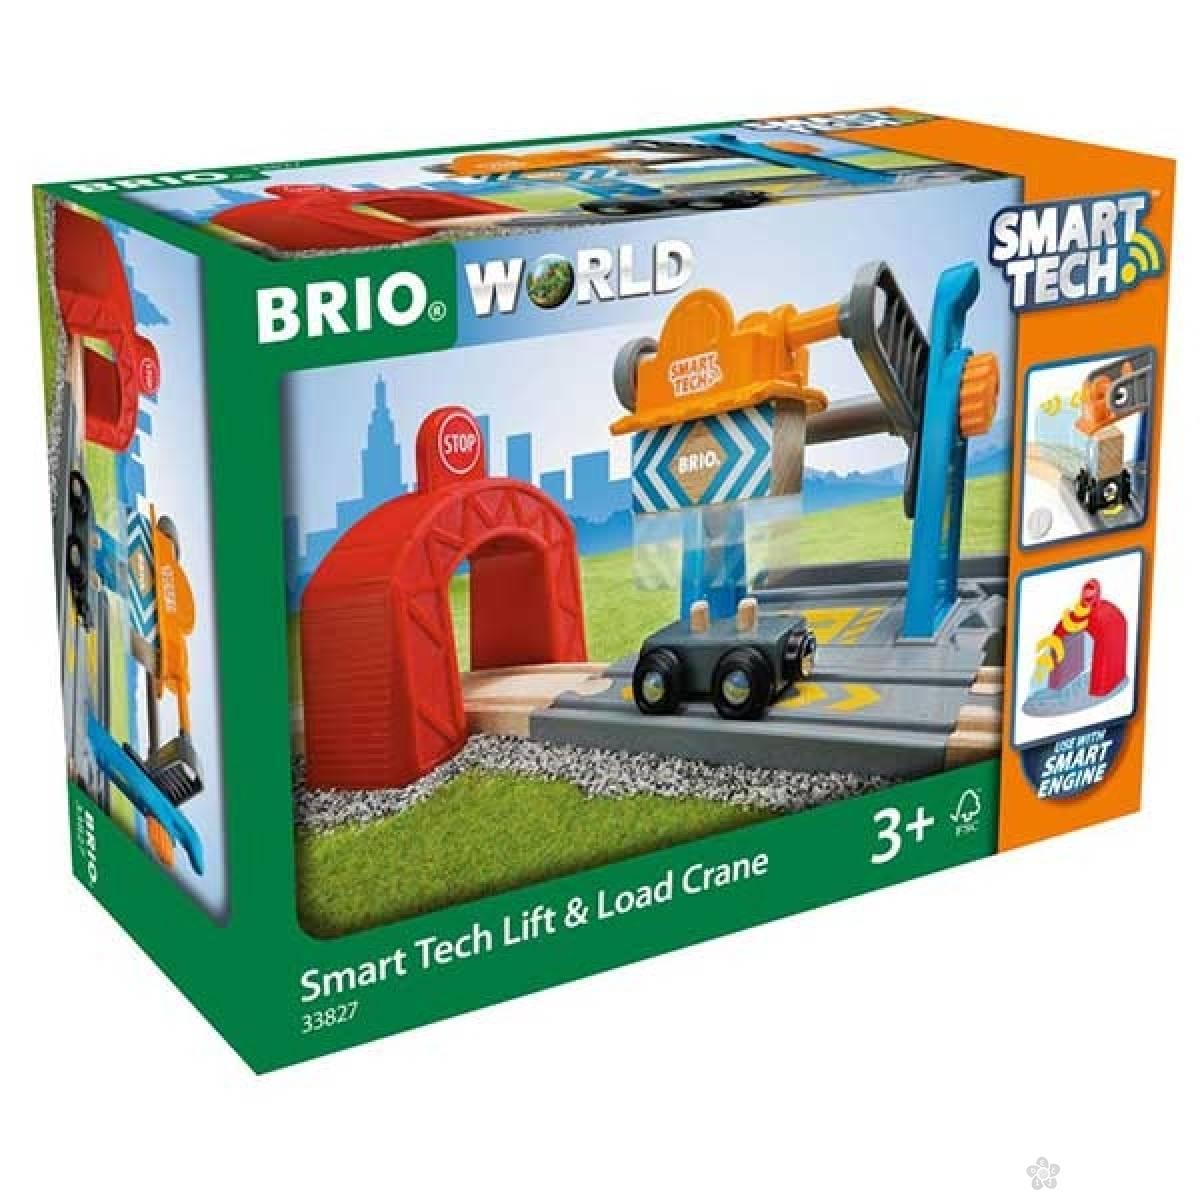 Smart Tech utovarivač Brio BR33827